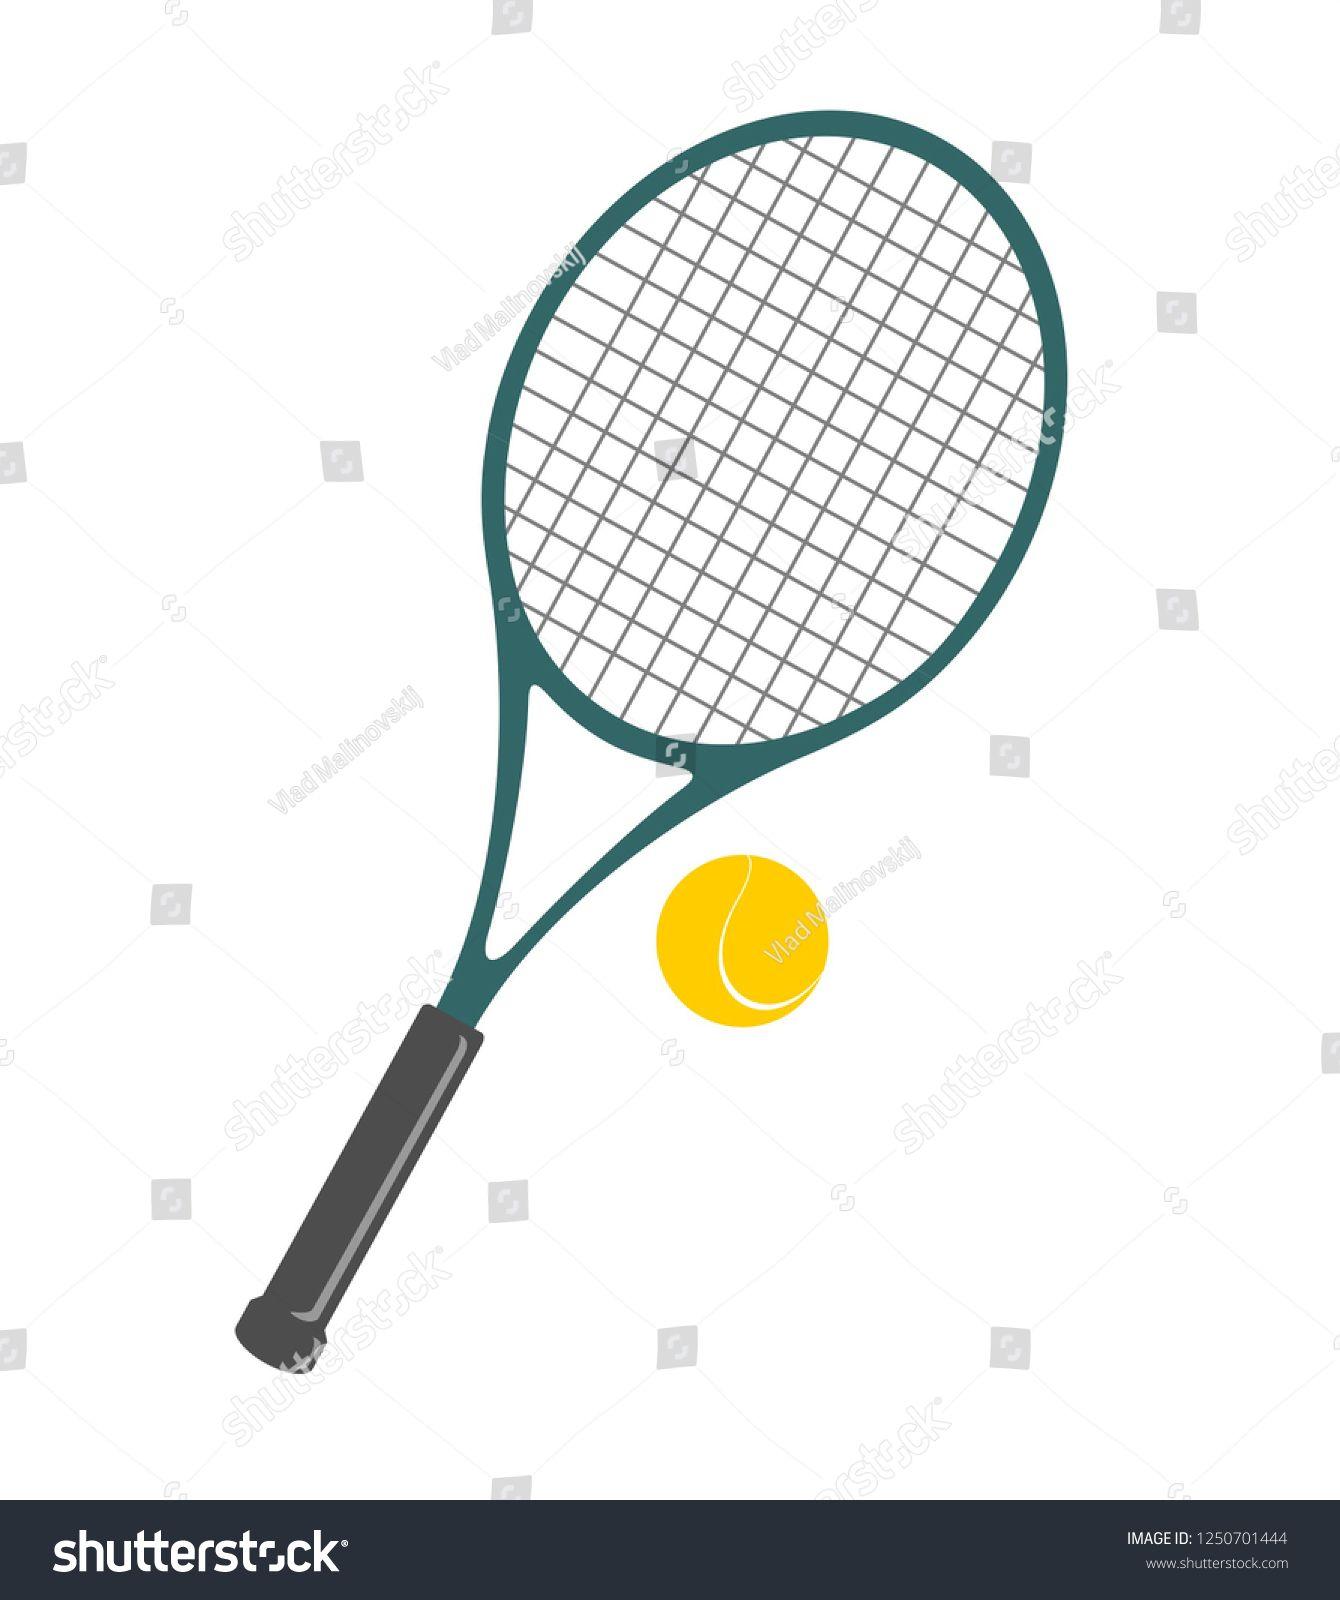 Tennis Ball And Racket Clip Art Ad Spon Ball Tennis Racket Art Tennis Racket Art Tennis Racket Tennis Ball